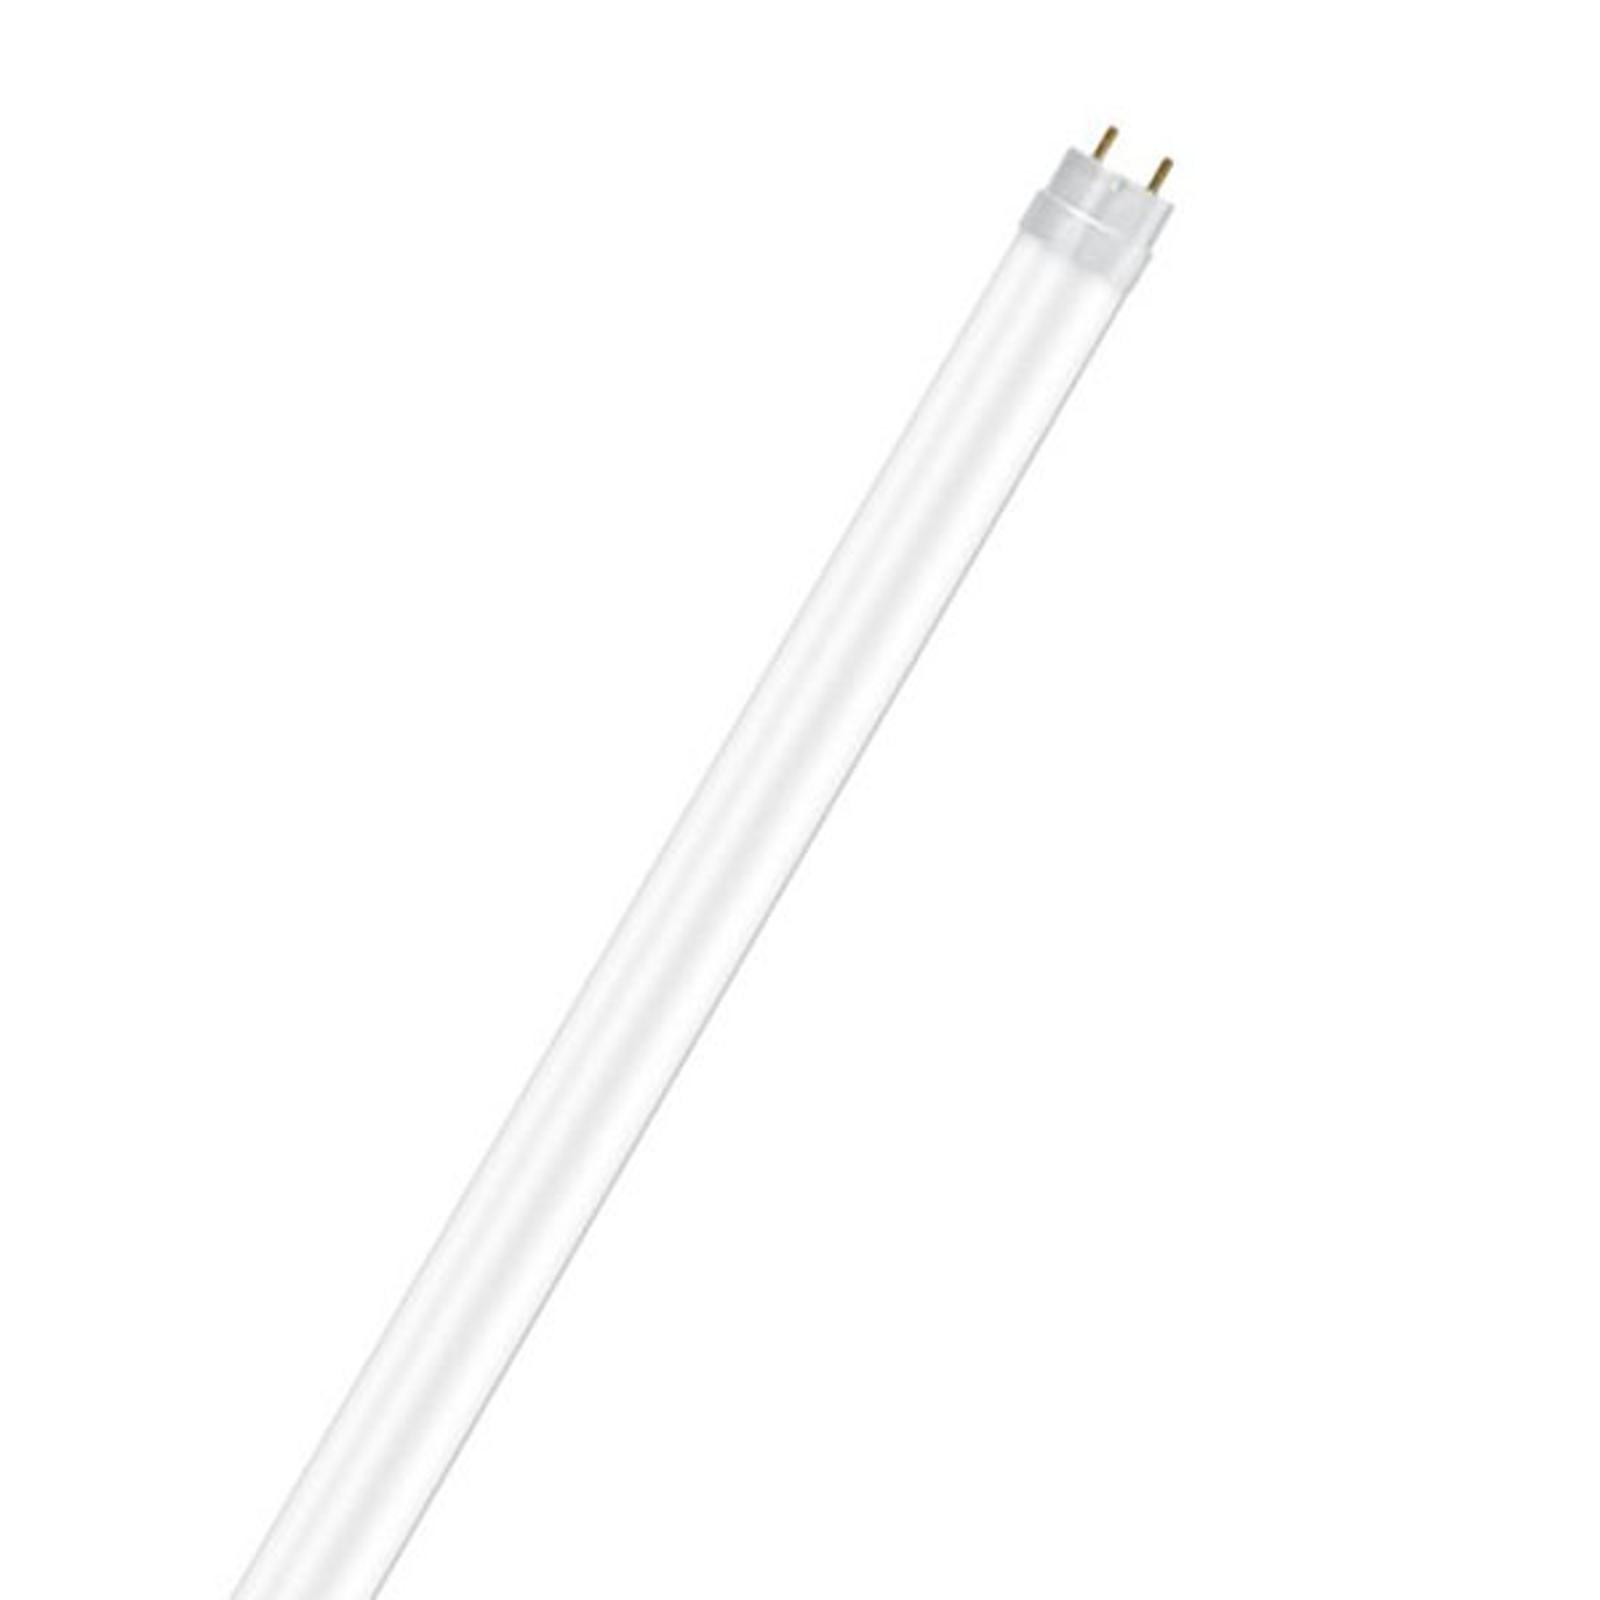 OSRAM-LED-putki G13 120cm SubstiTUBE 16W 6 500 K